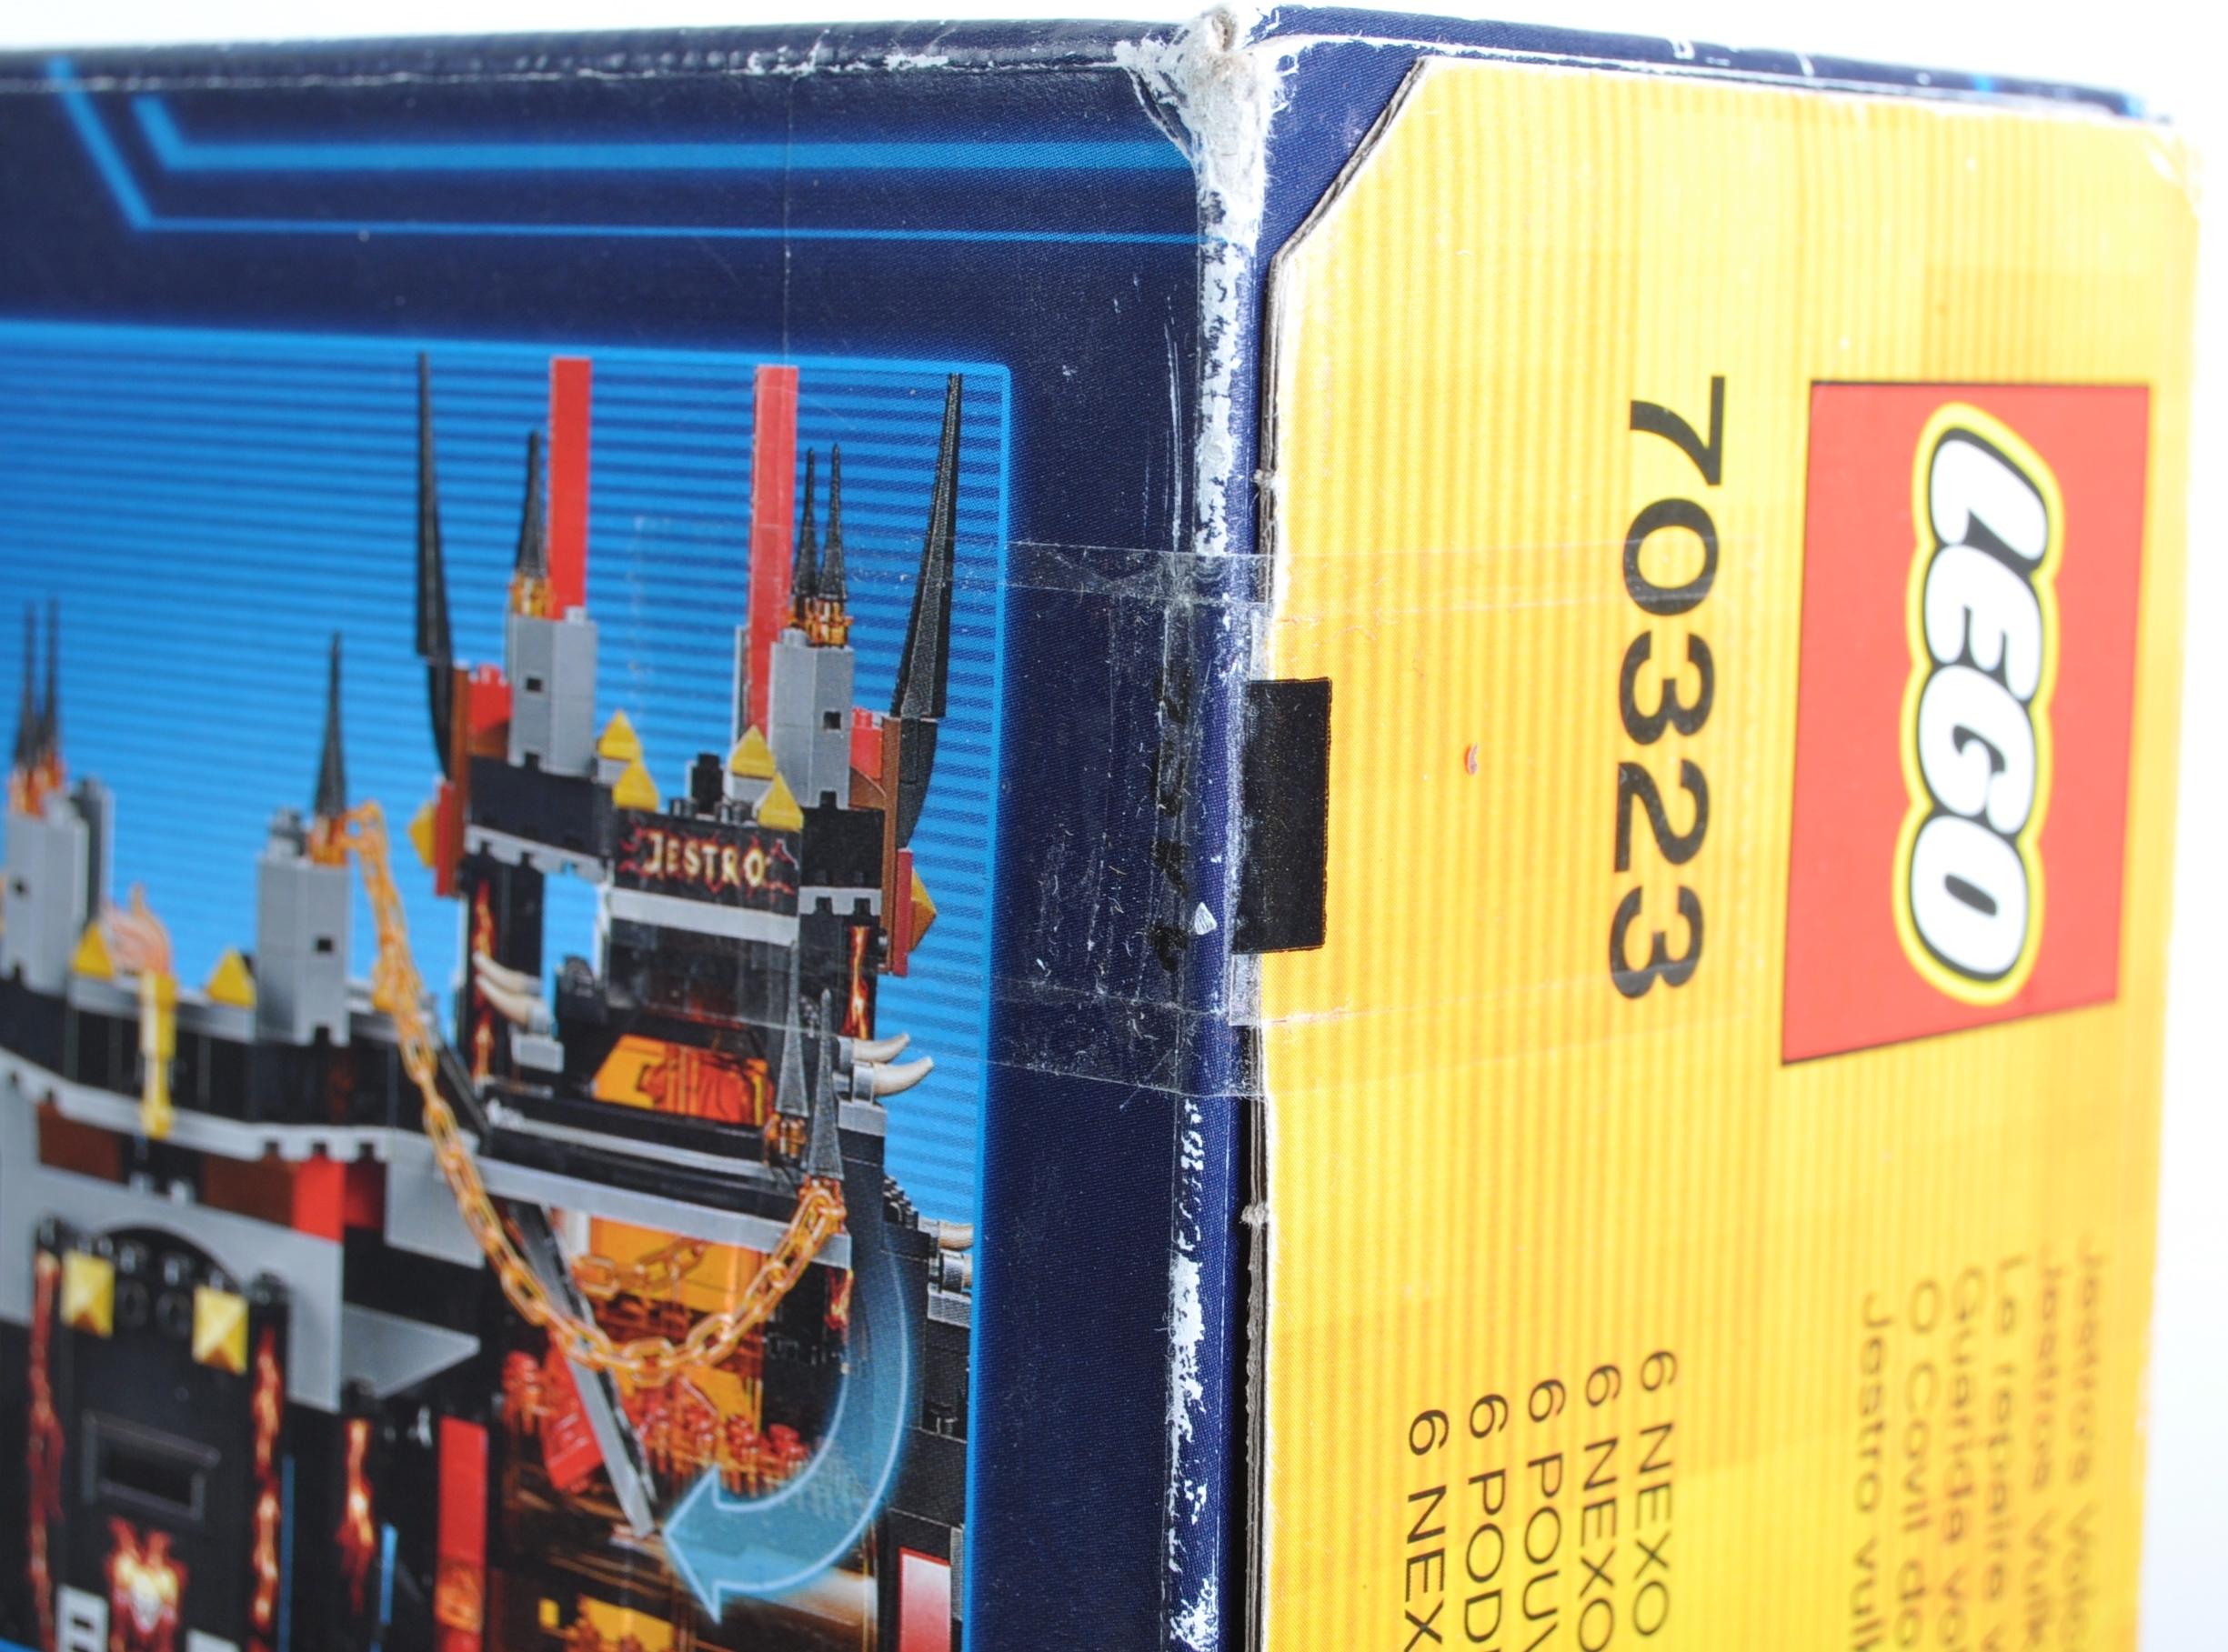 LEGO SET - NEXO KNIGHTS - 70323 JESTRO'S VOLCANO LAIR - Image 4 of 4